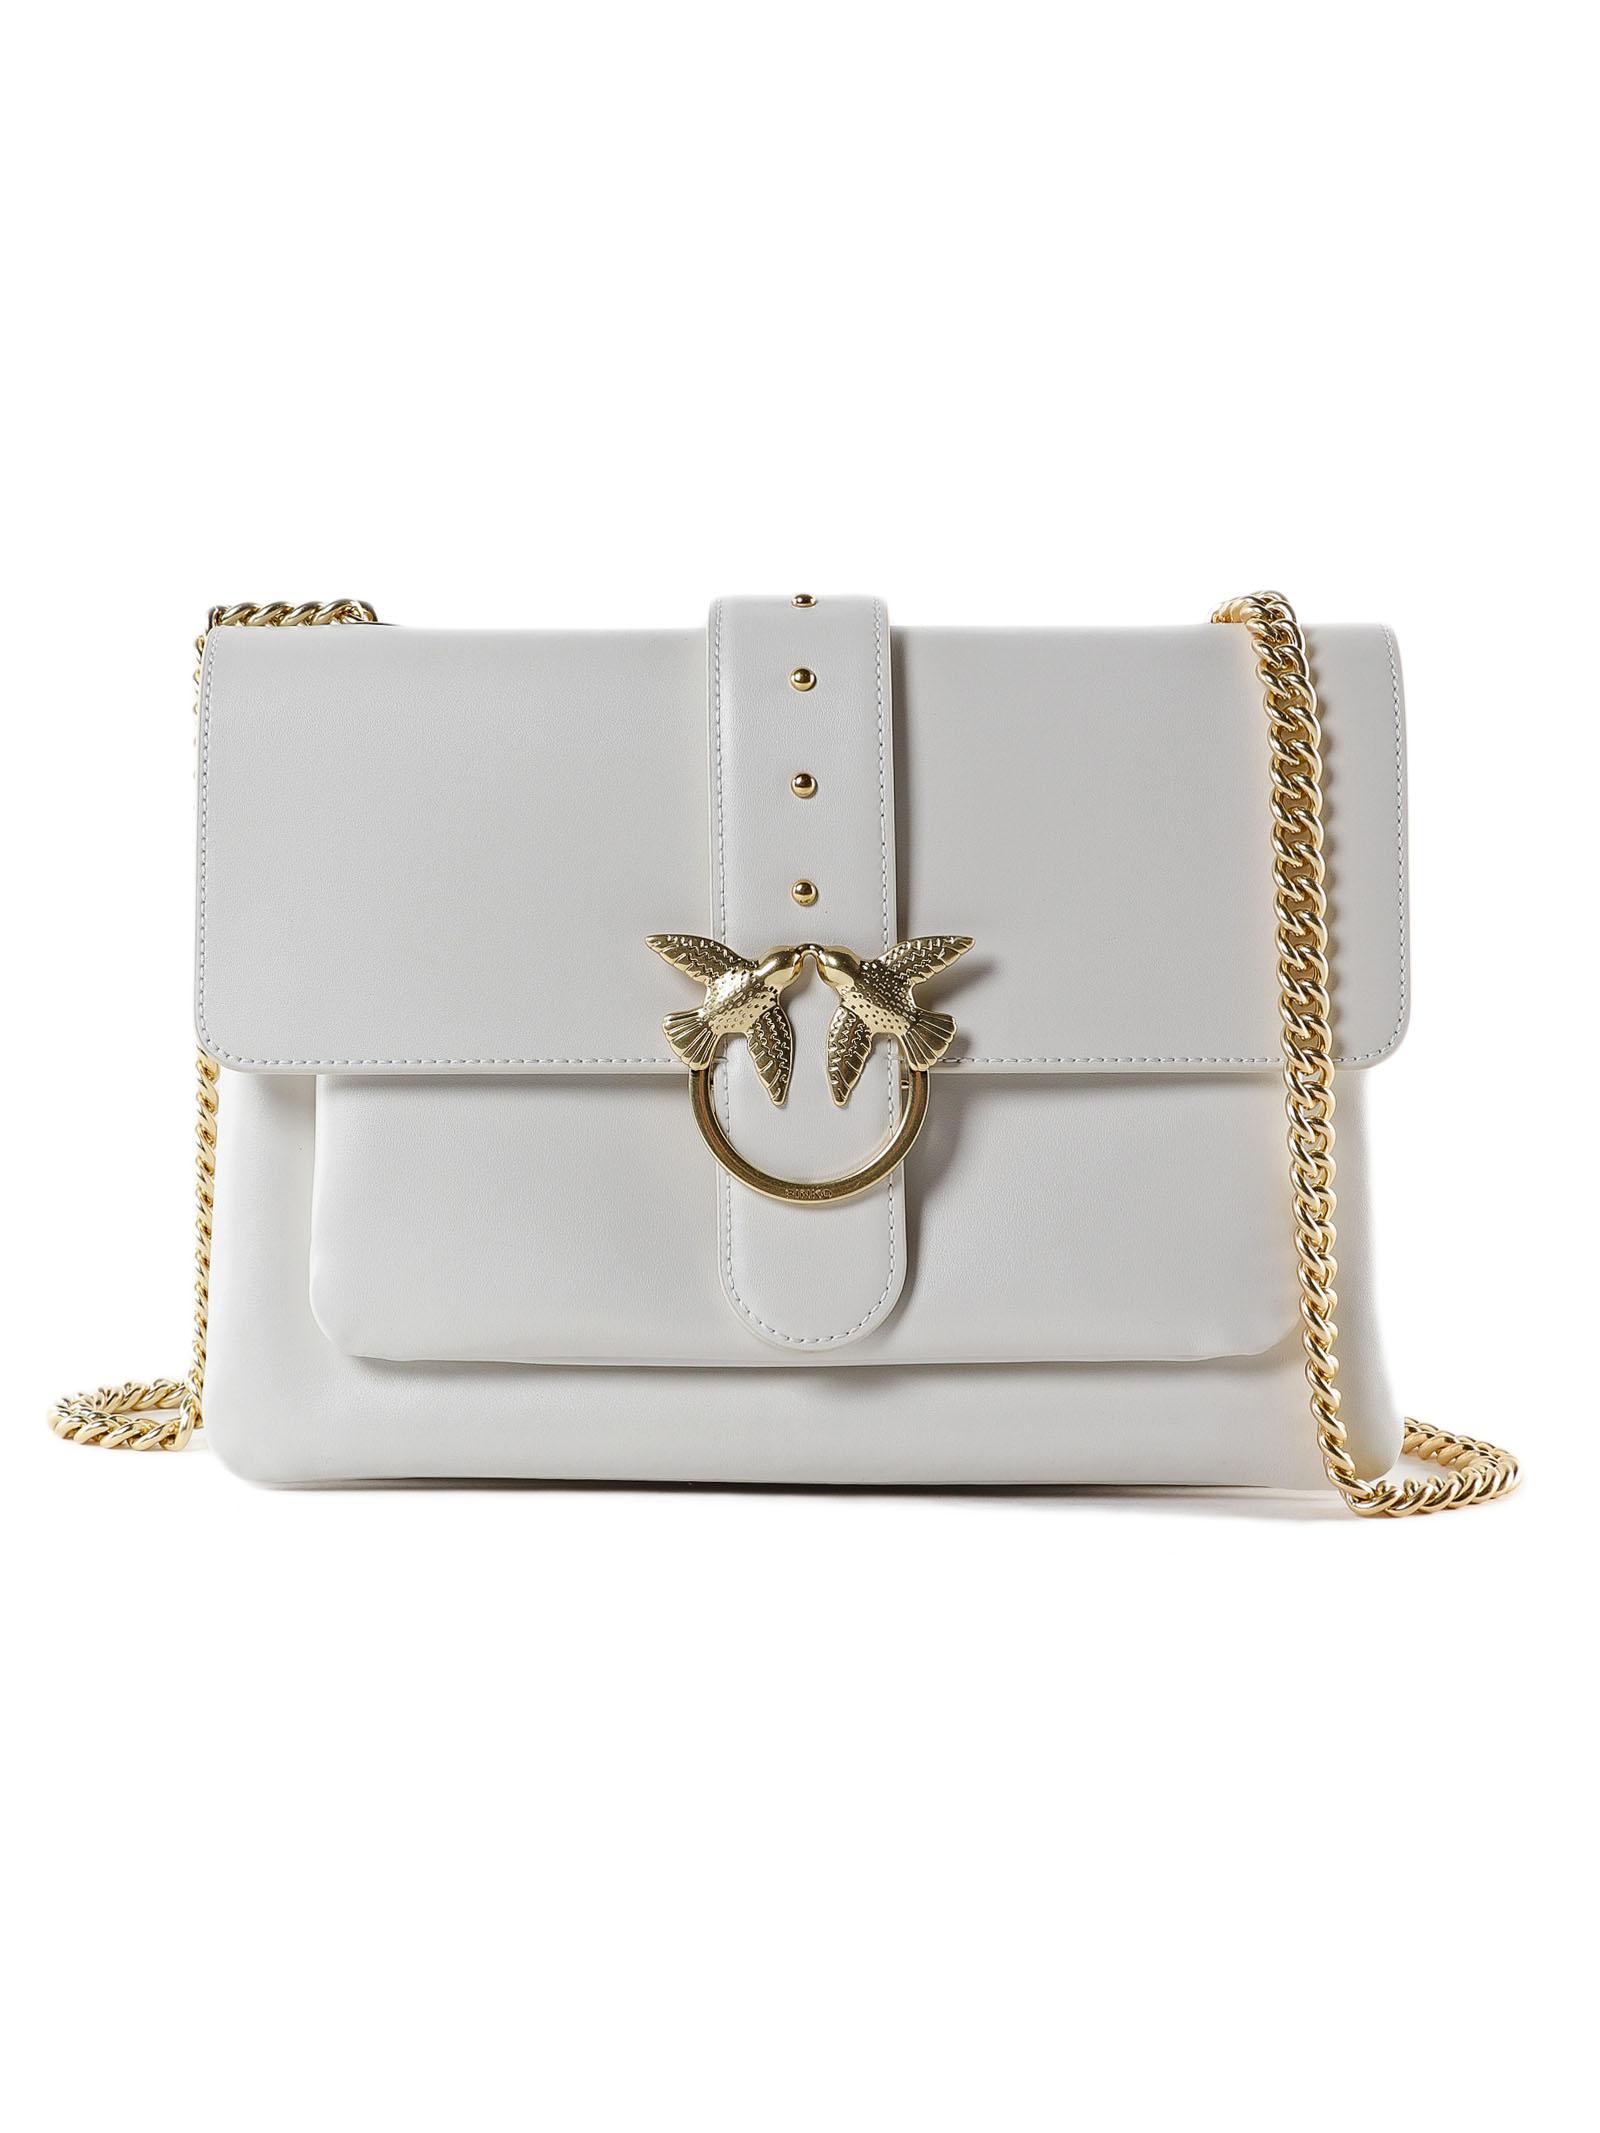 dc02d7e9d6511 Lyst - Pinko Big Love Simply 1 Bag in White